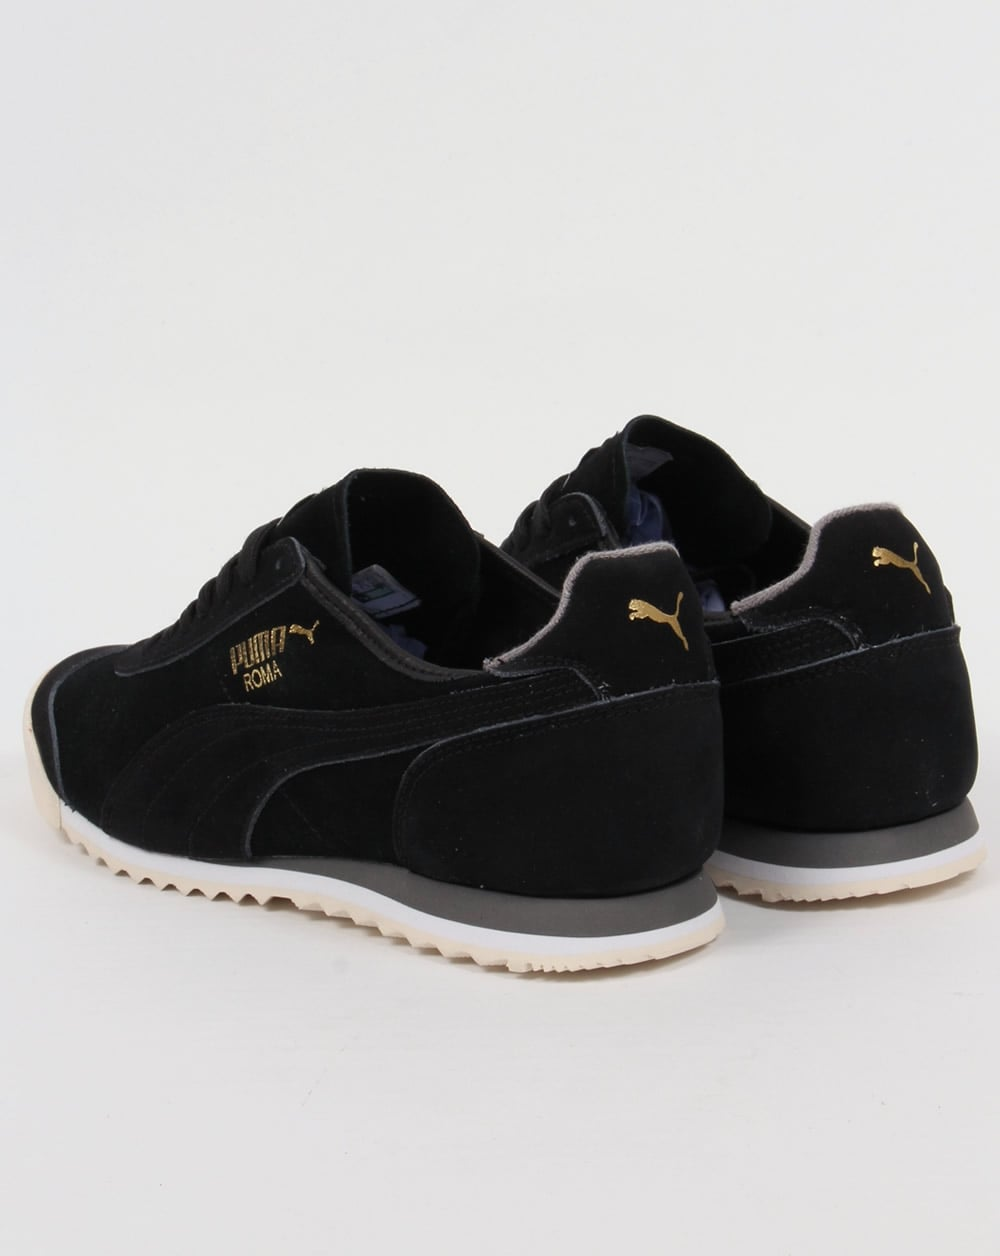 Puma Roma OG Leather Trainers Black Grey 73f9737d0